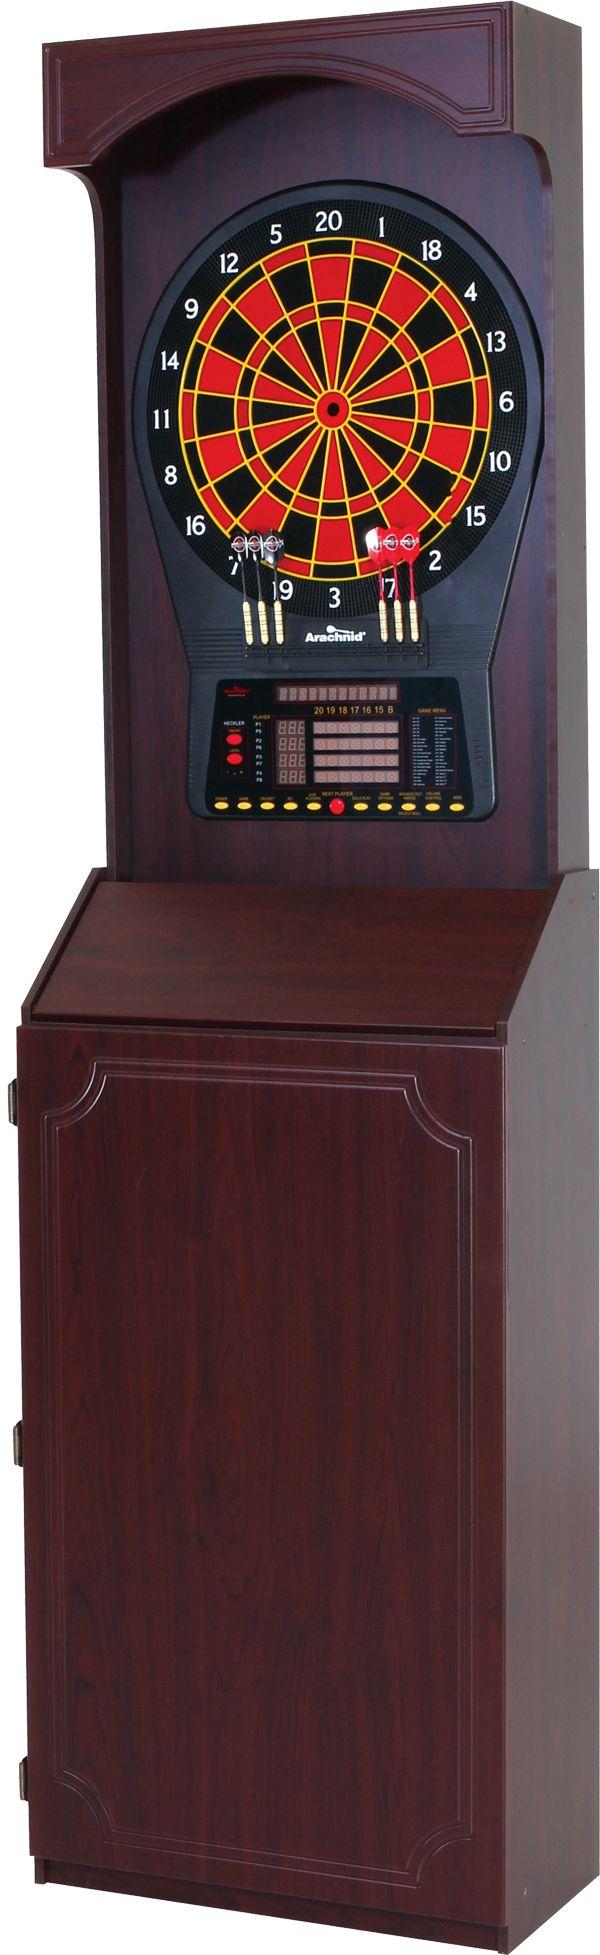 Arachnid CricketPro 800 Electronic Dartboard Cabinet. NoImageFound. 1